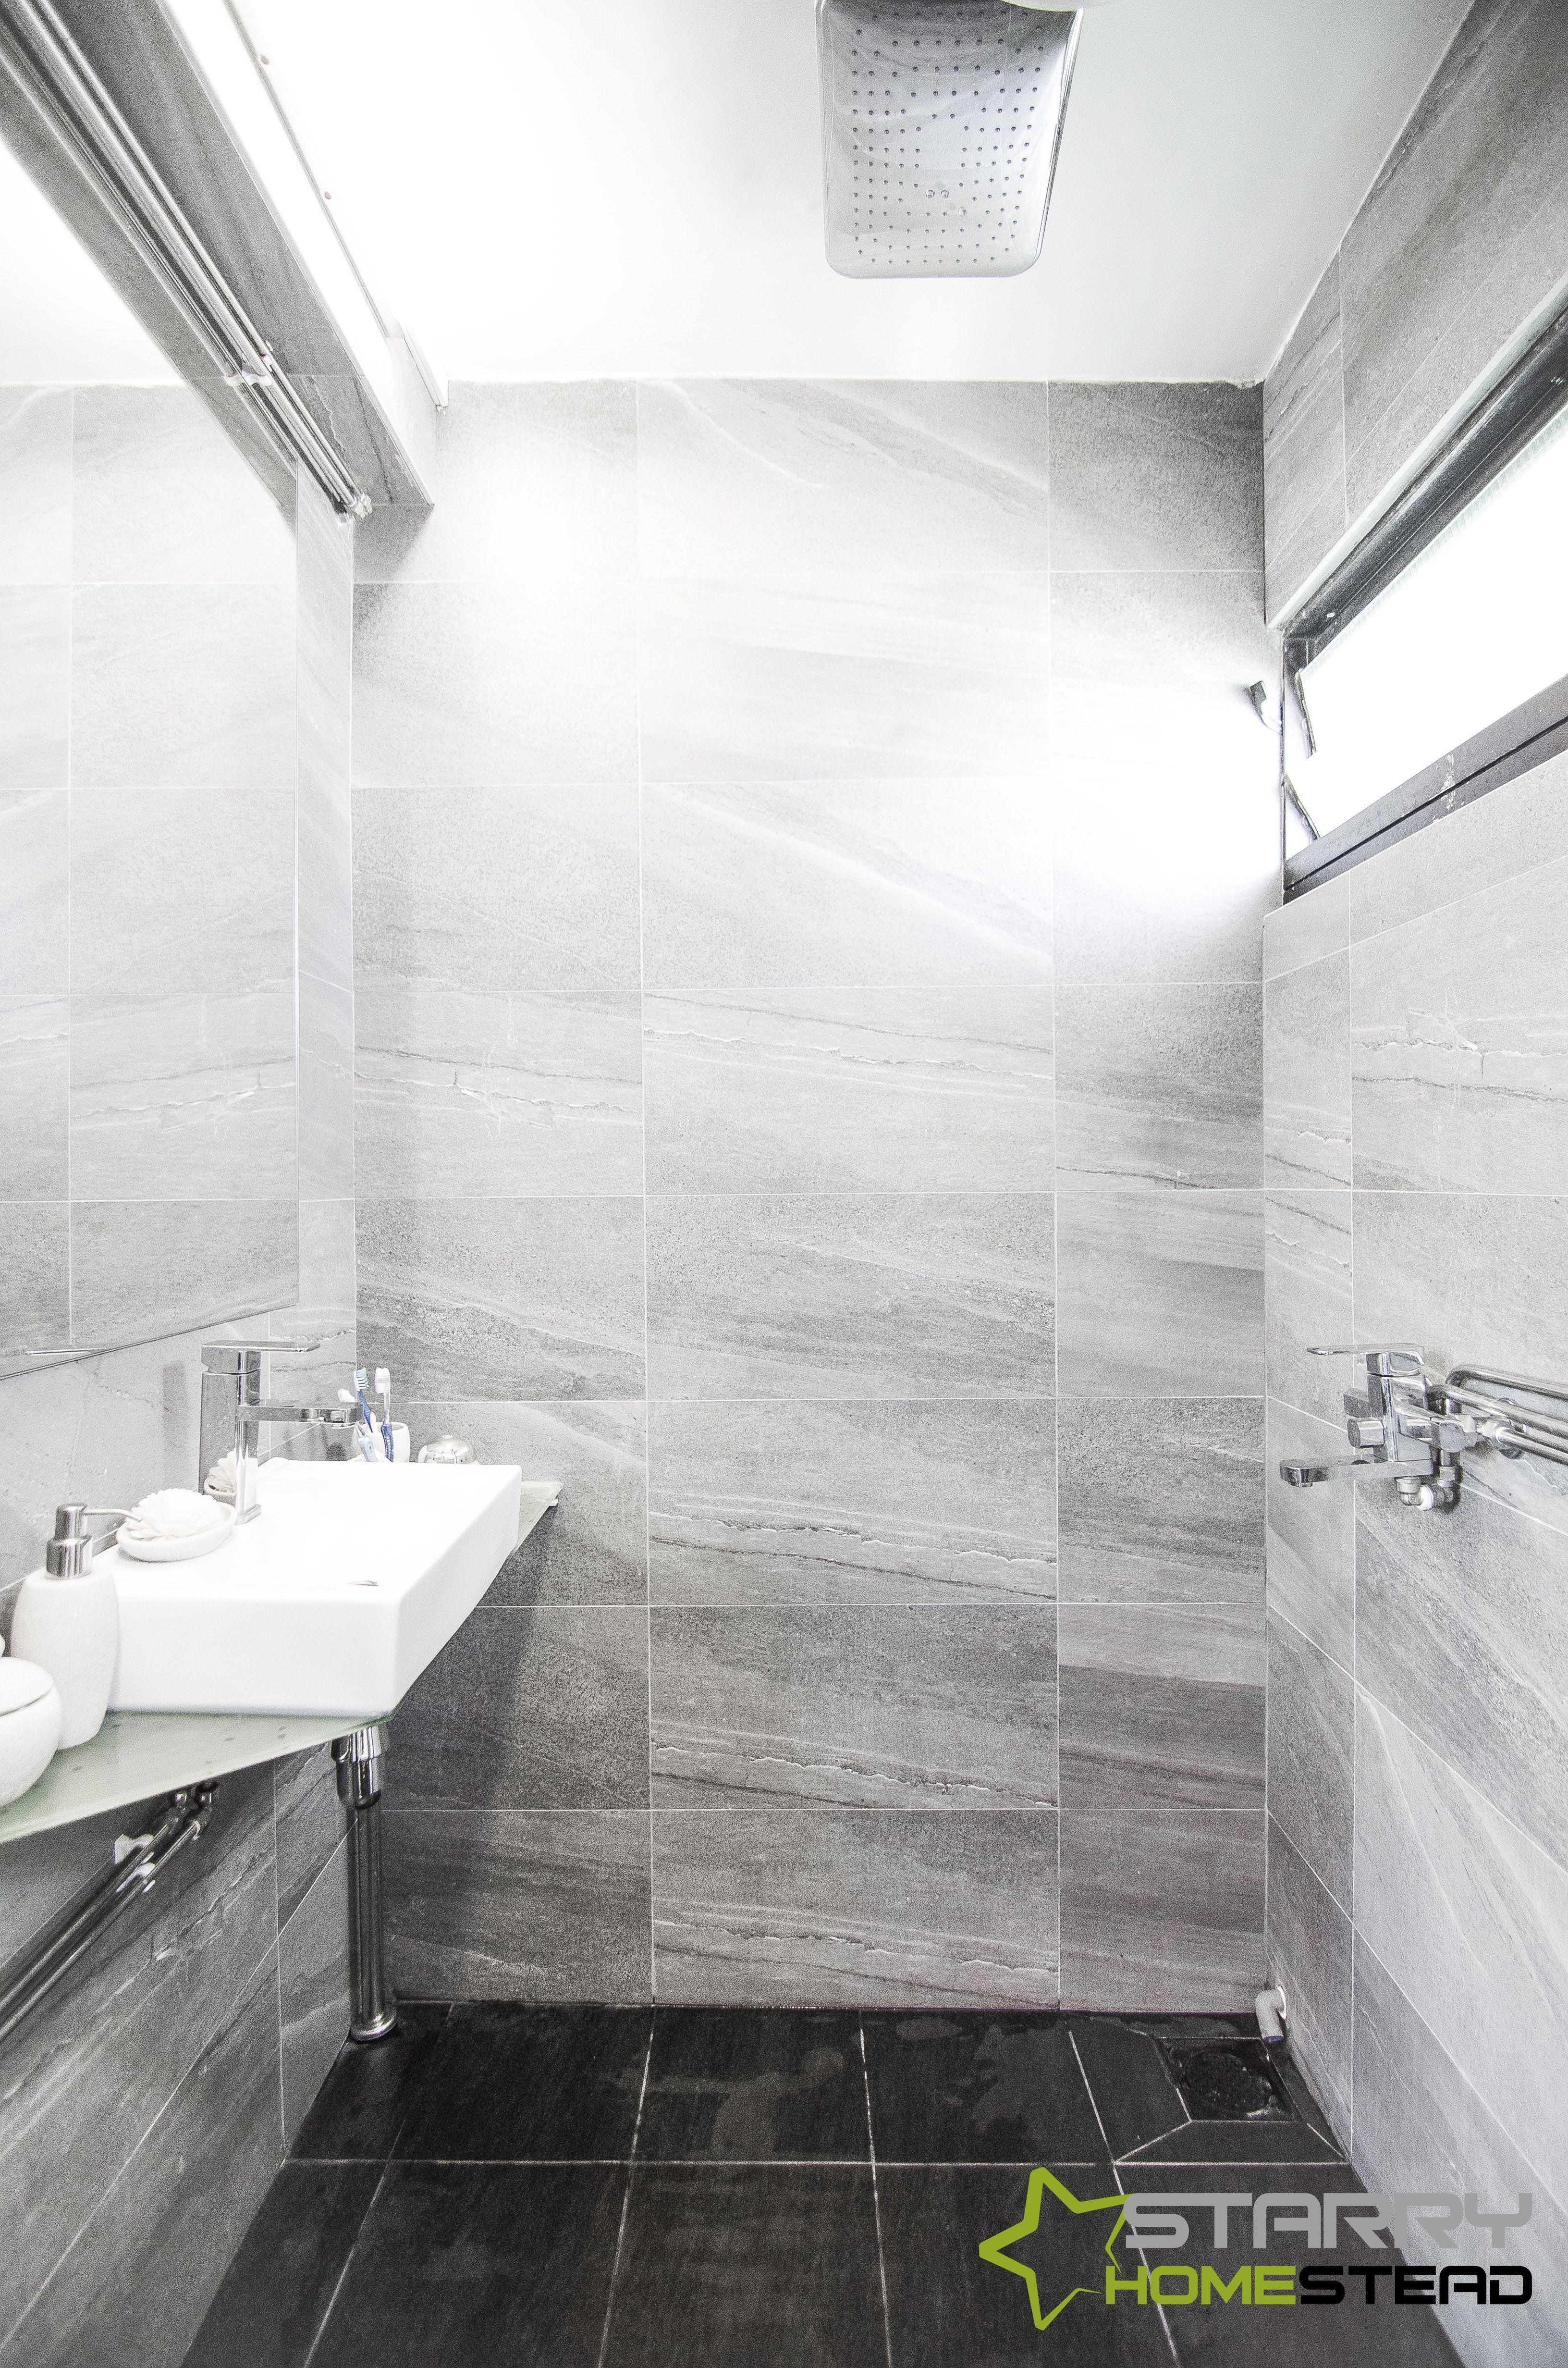 Pin By Starry Homestead On Telok Bangla Crescent Bathrooms Remodel Toilet Design Design